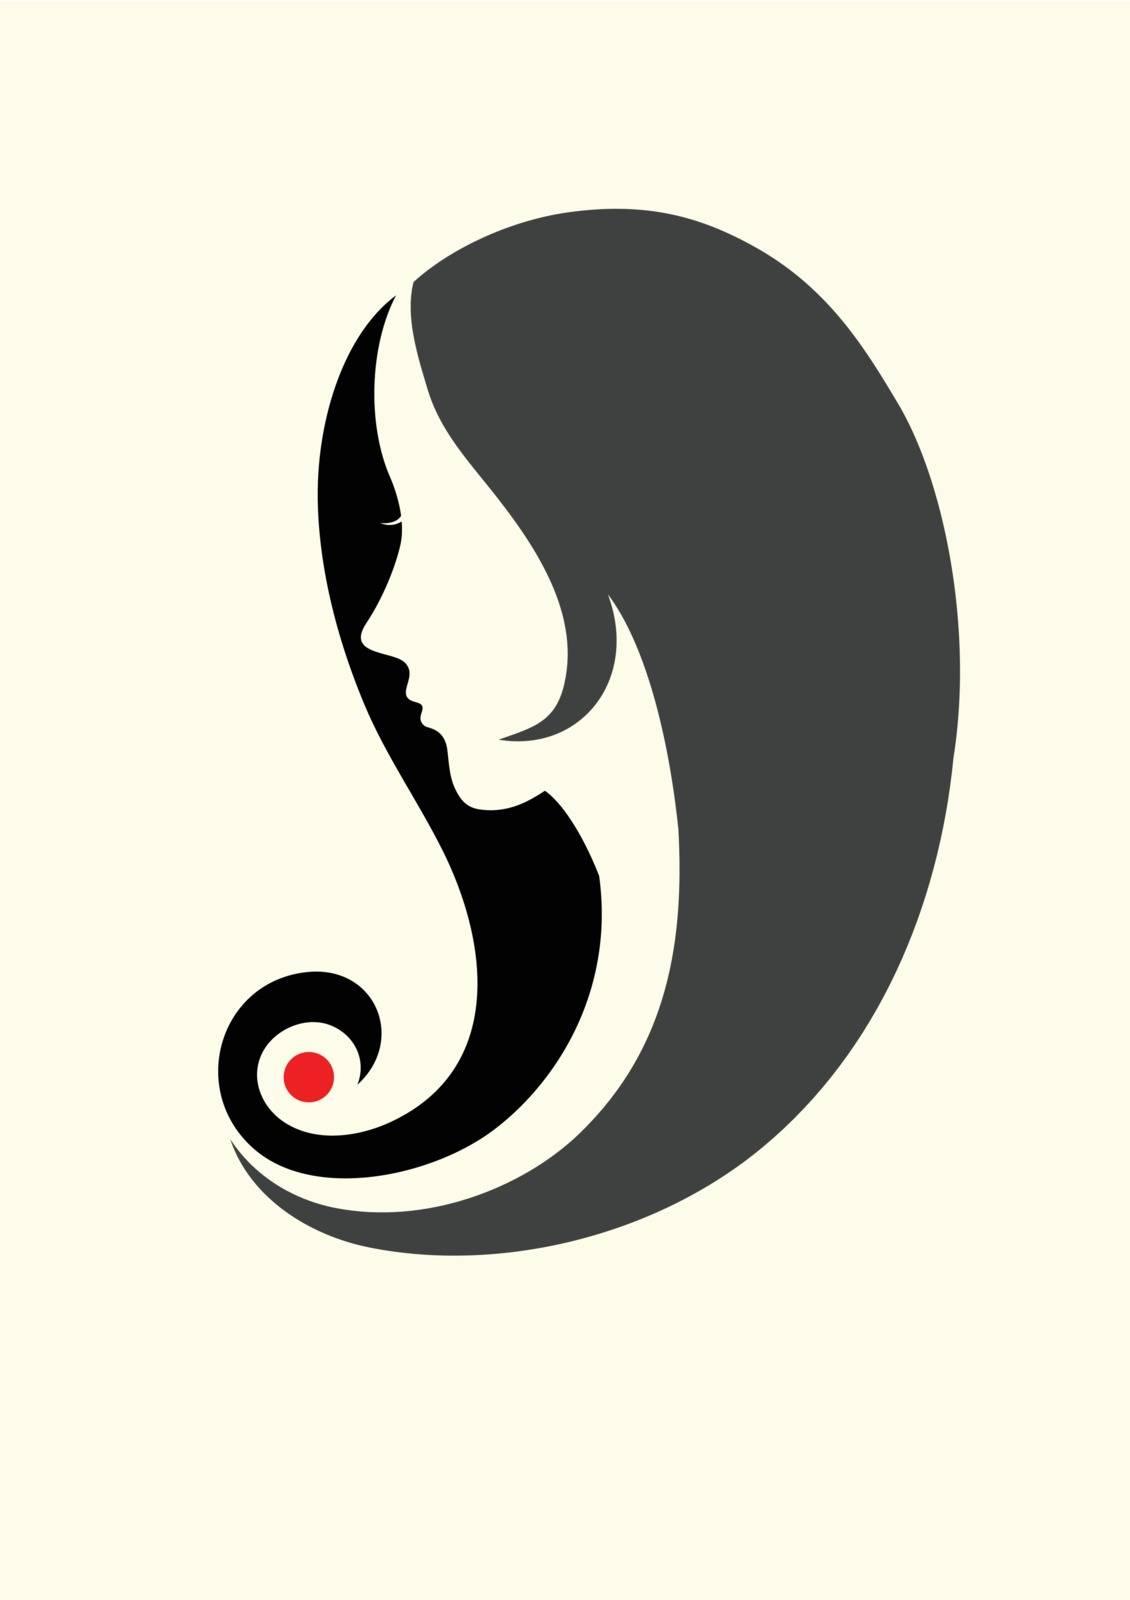 Beauty hair style icon, art vector logo design